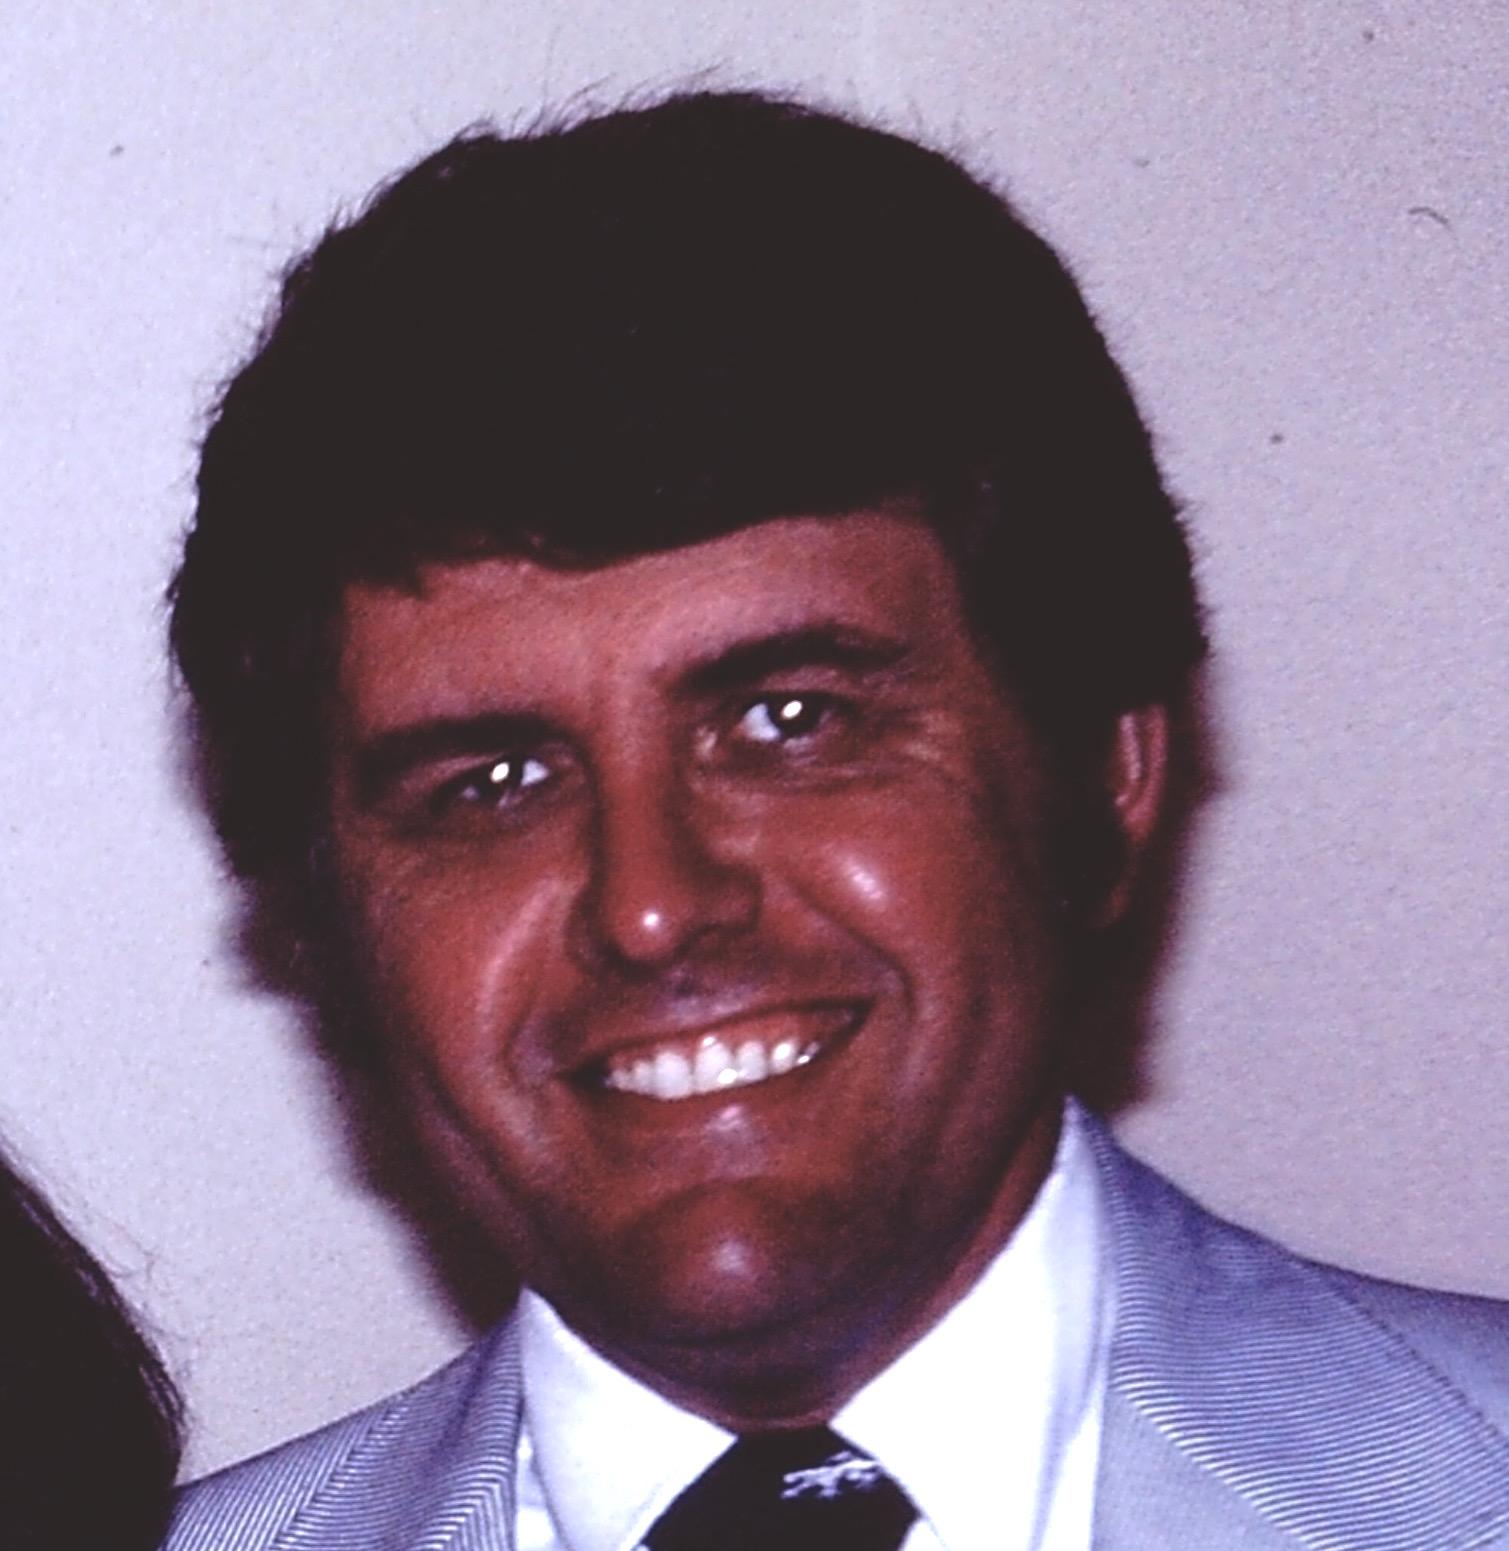 Phil Little / Circa 1970's